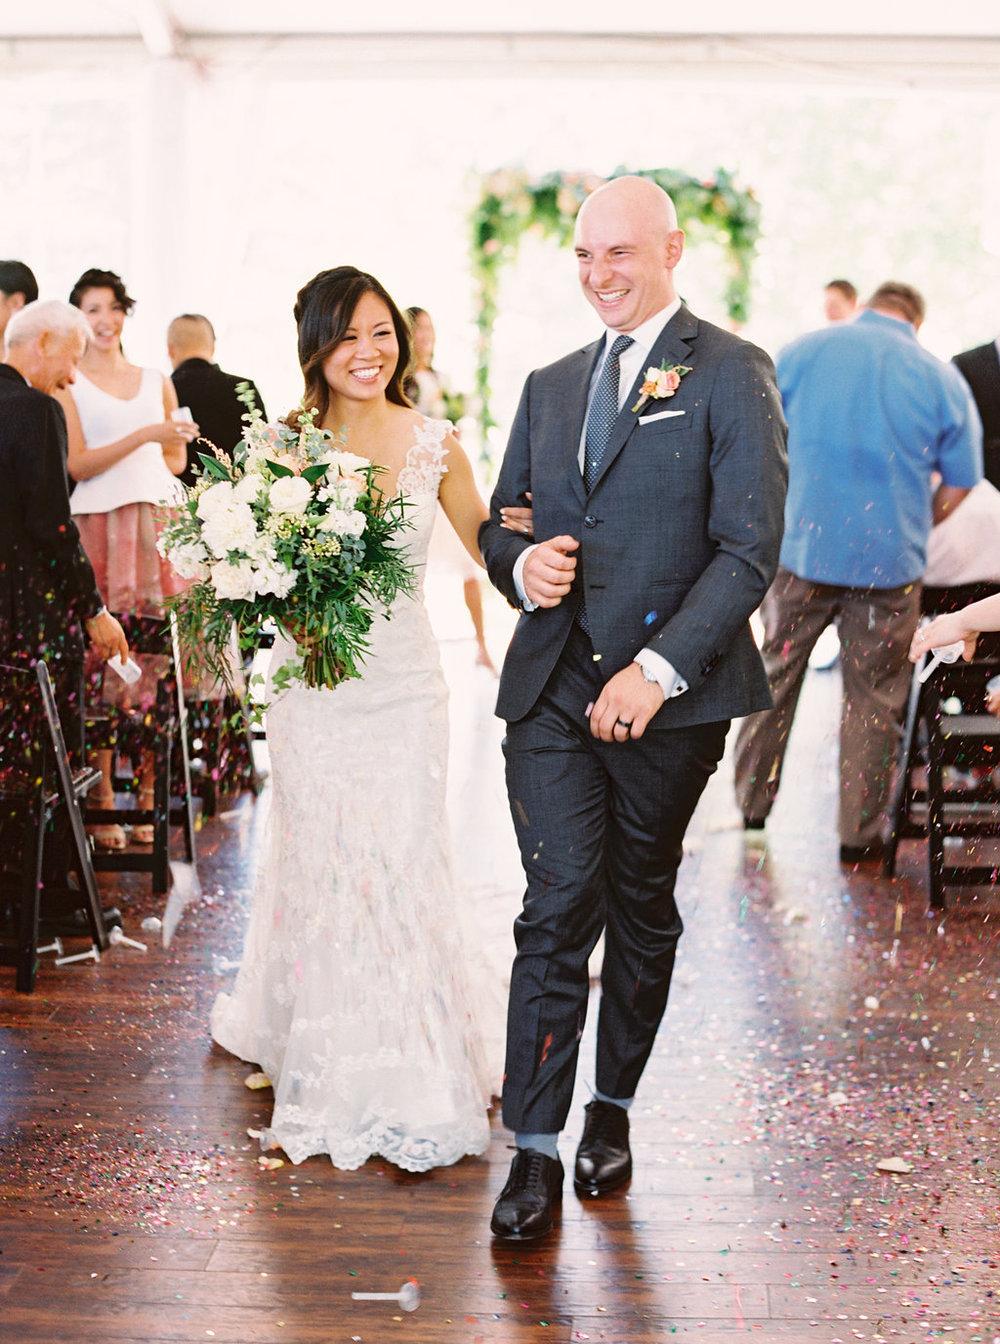 Tented Outdoors Wedding - Jenn + Marc